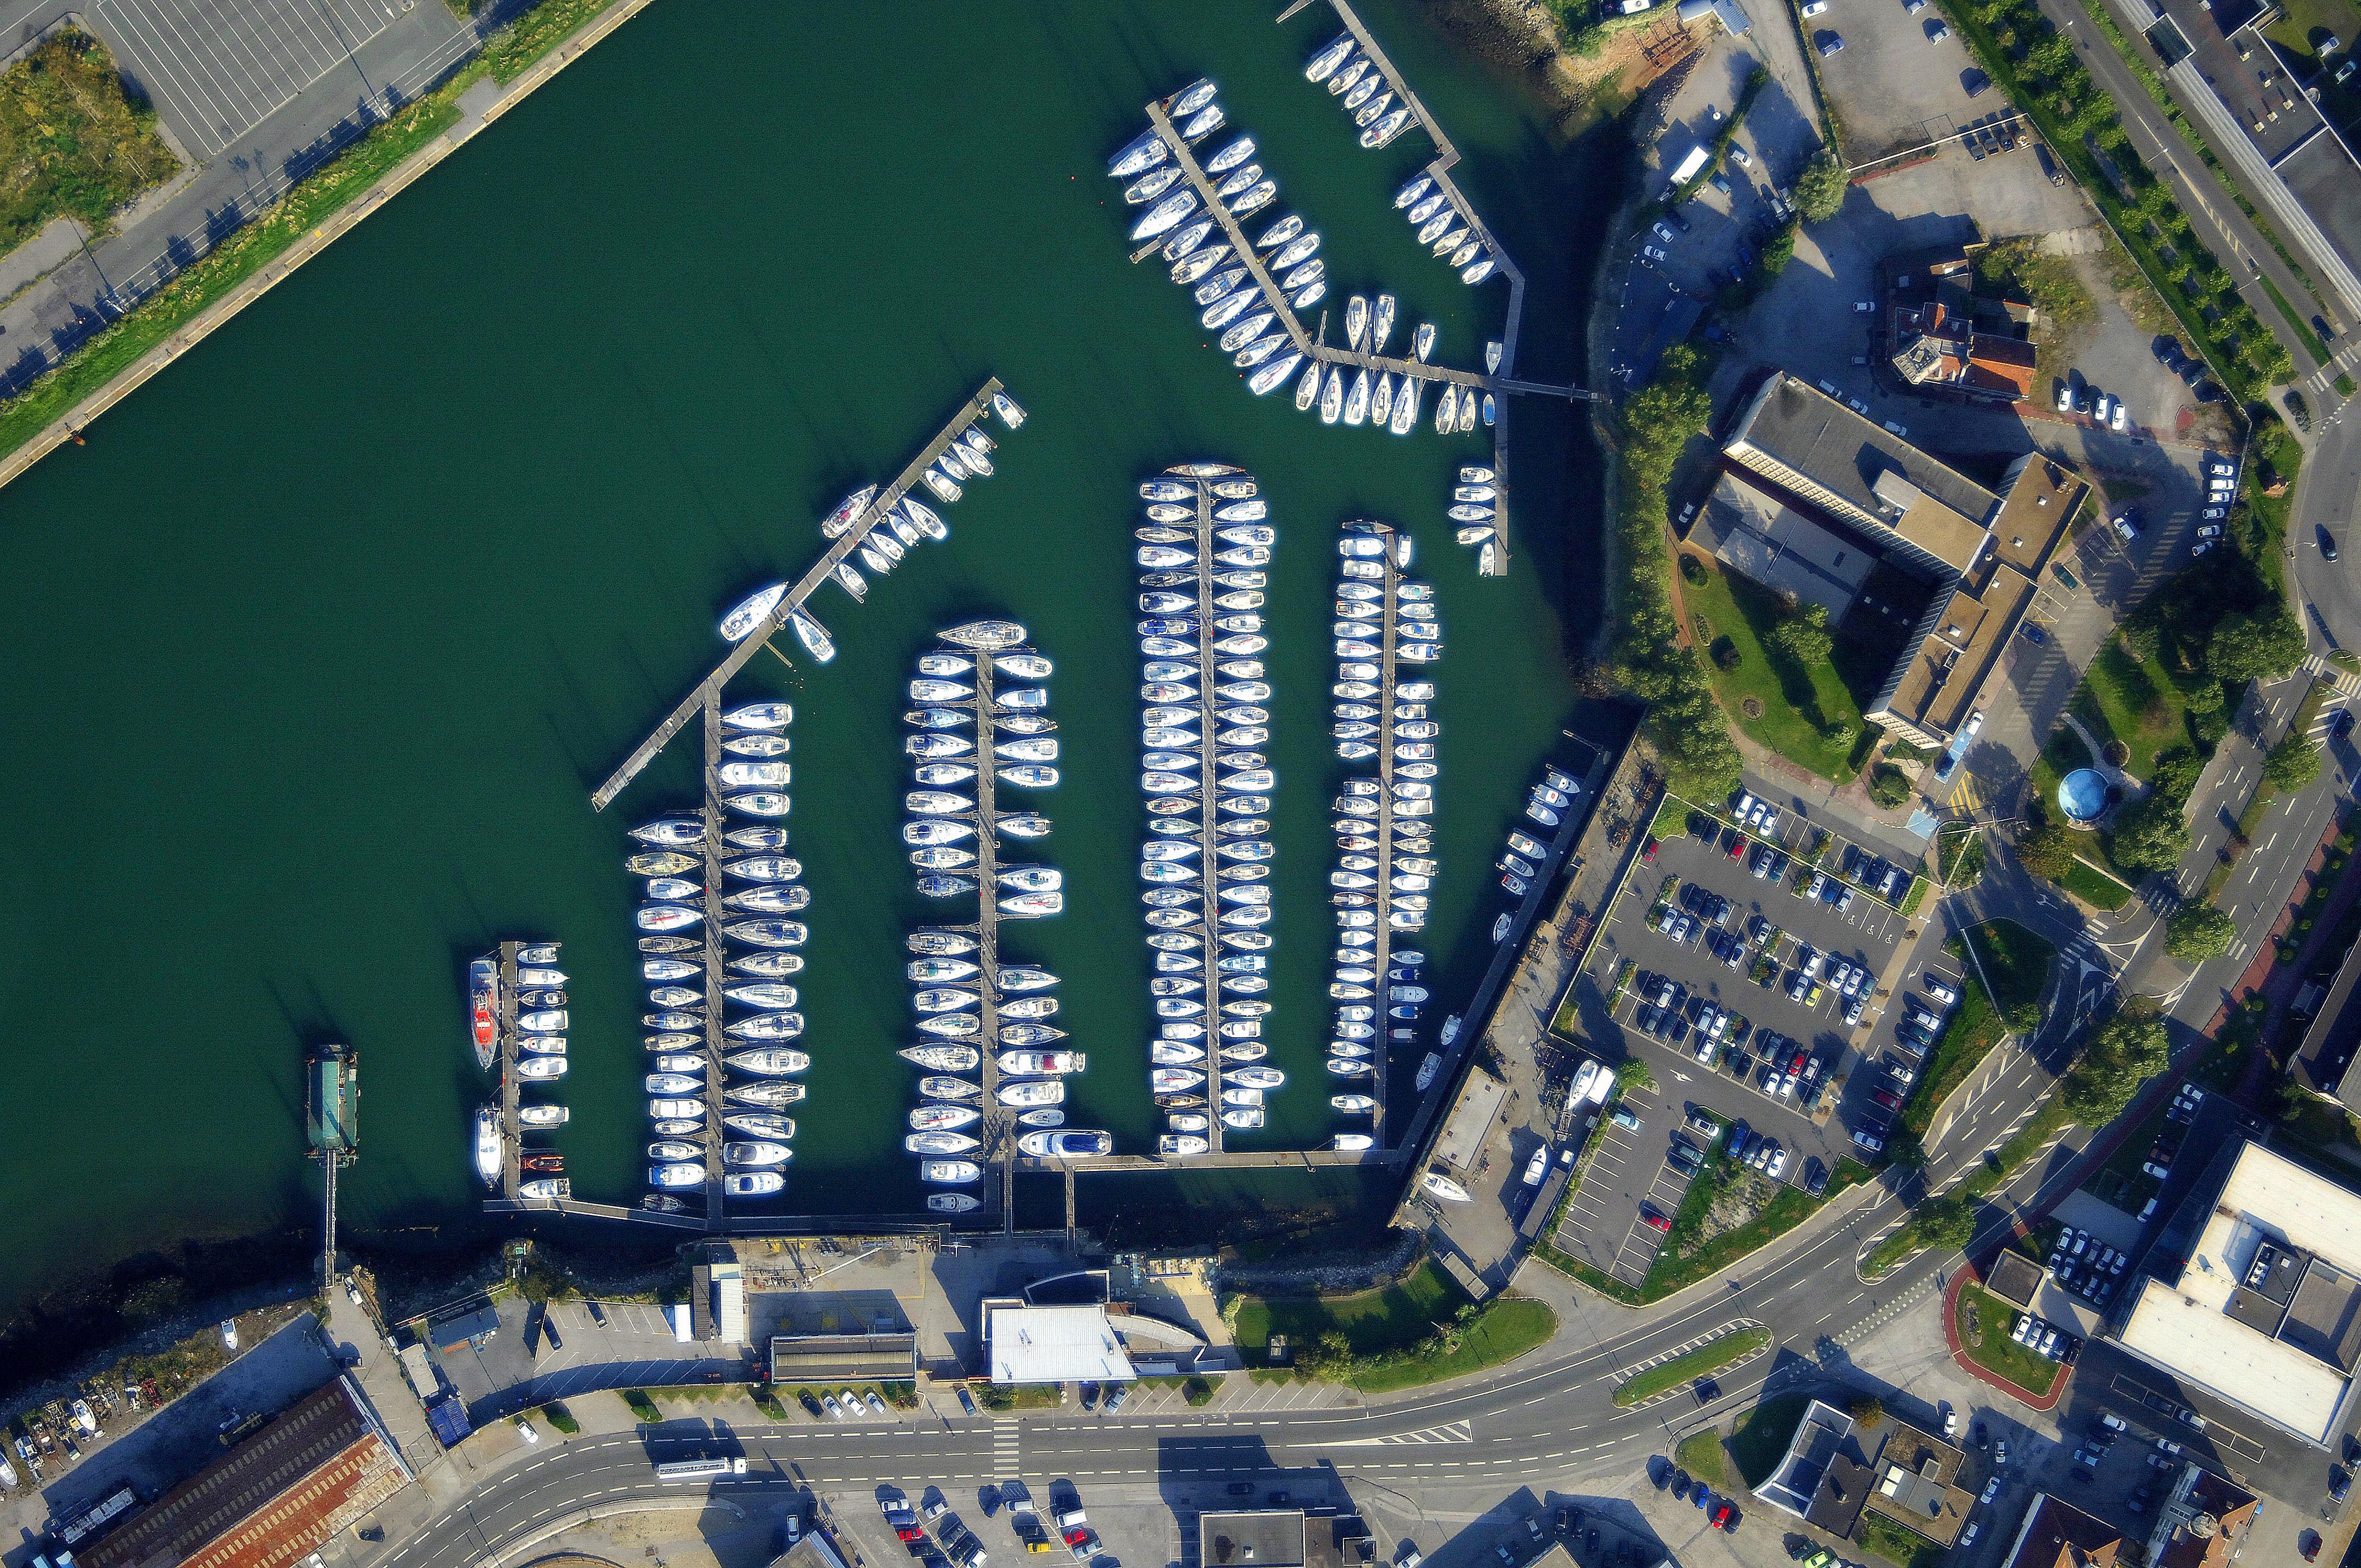 Port of plaisance de dunkerque marina in dunkerque norde - Mobilier de france dunkerque ...